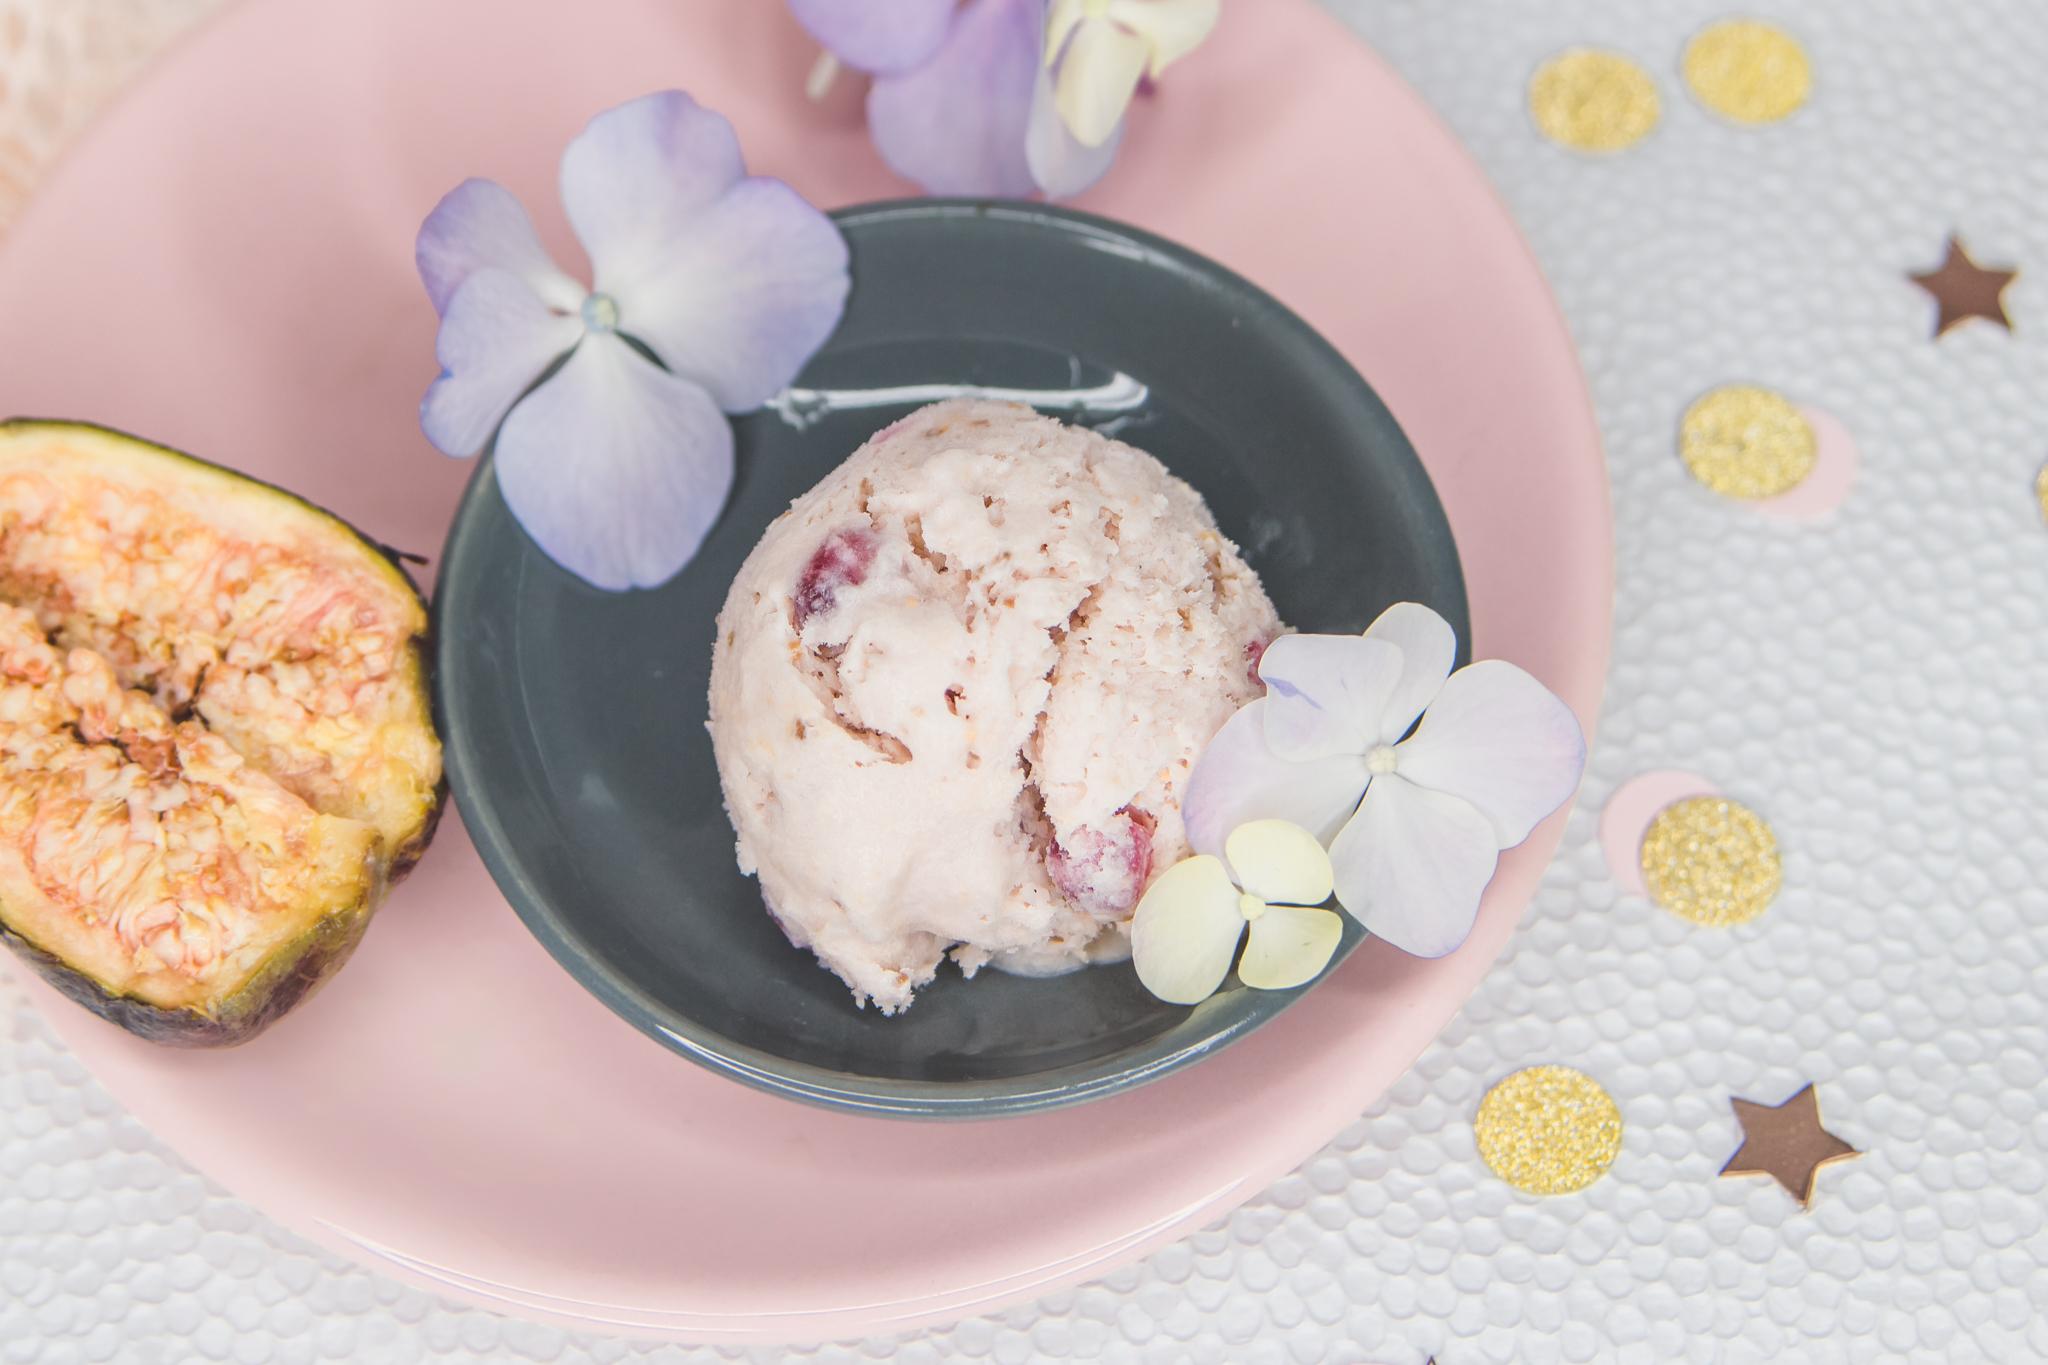 Feige-Granatapfel Eis